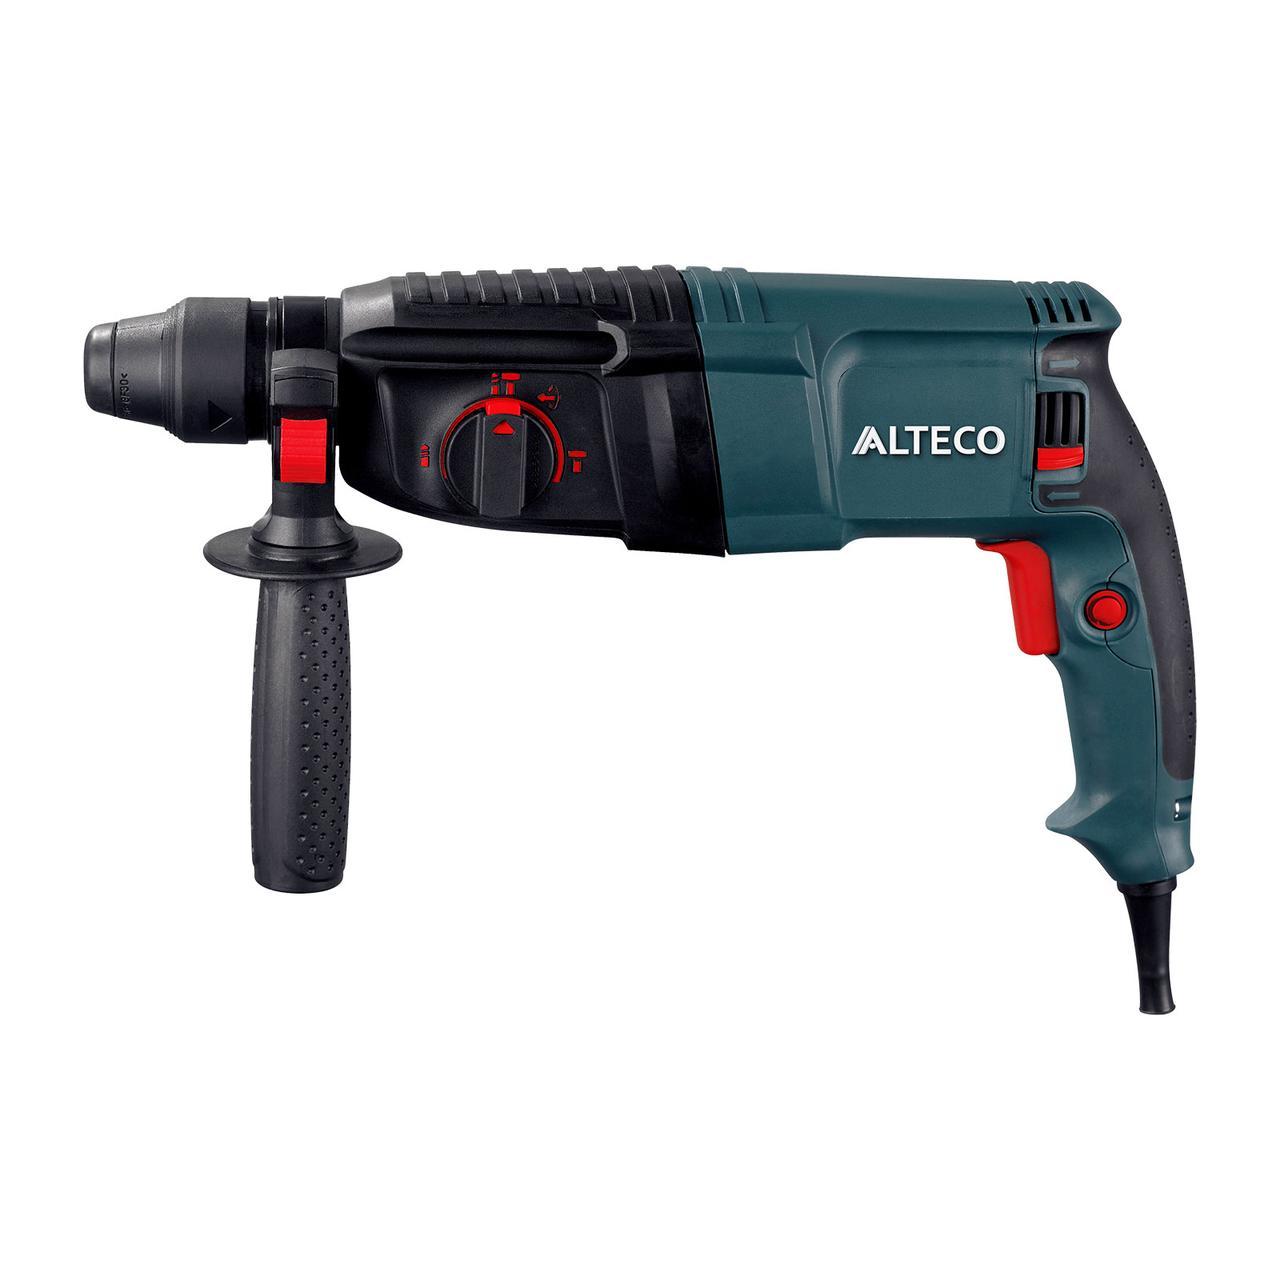 Перфоратор SDS PLUS RH 0215 (RH 800-26) promo / 26 mm ALTECO